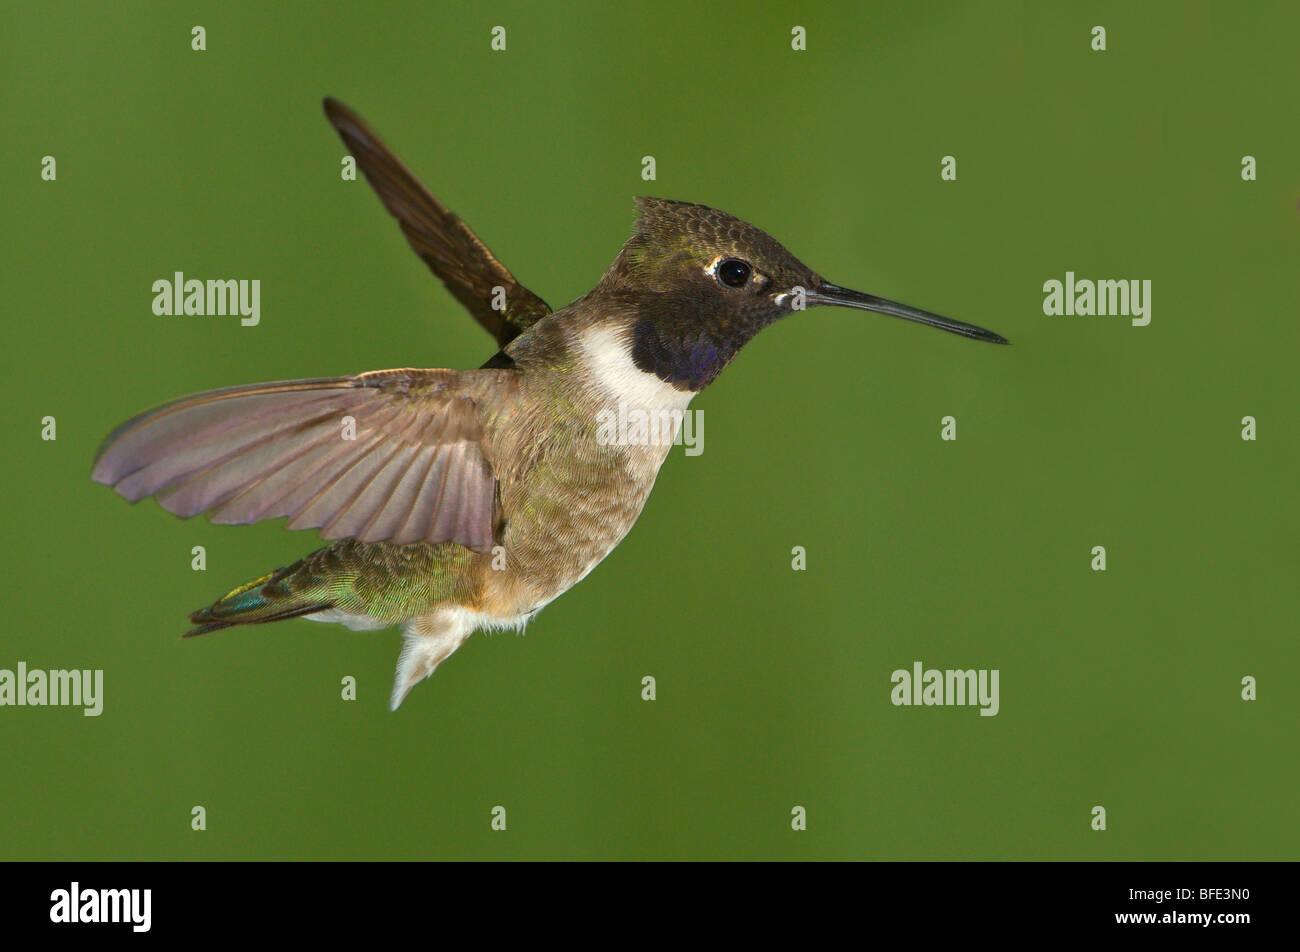 Male Black-chinned hummingbird (Archilochus alexandri) in flight at Fort Simcoe State Park, Washington, USA - Stock Image